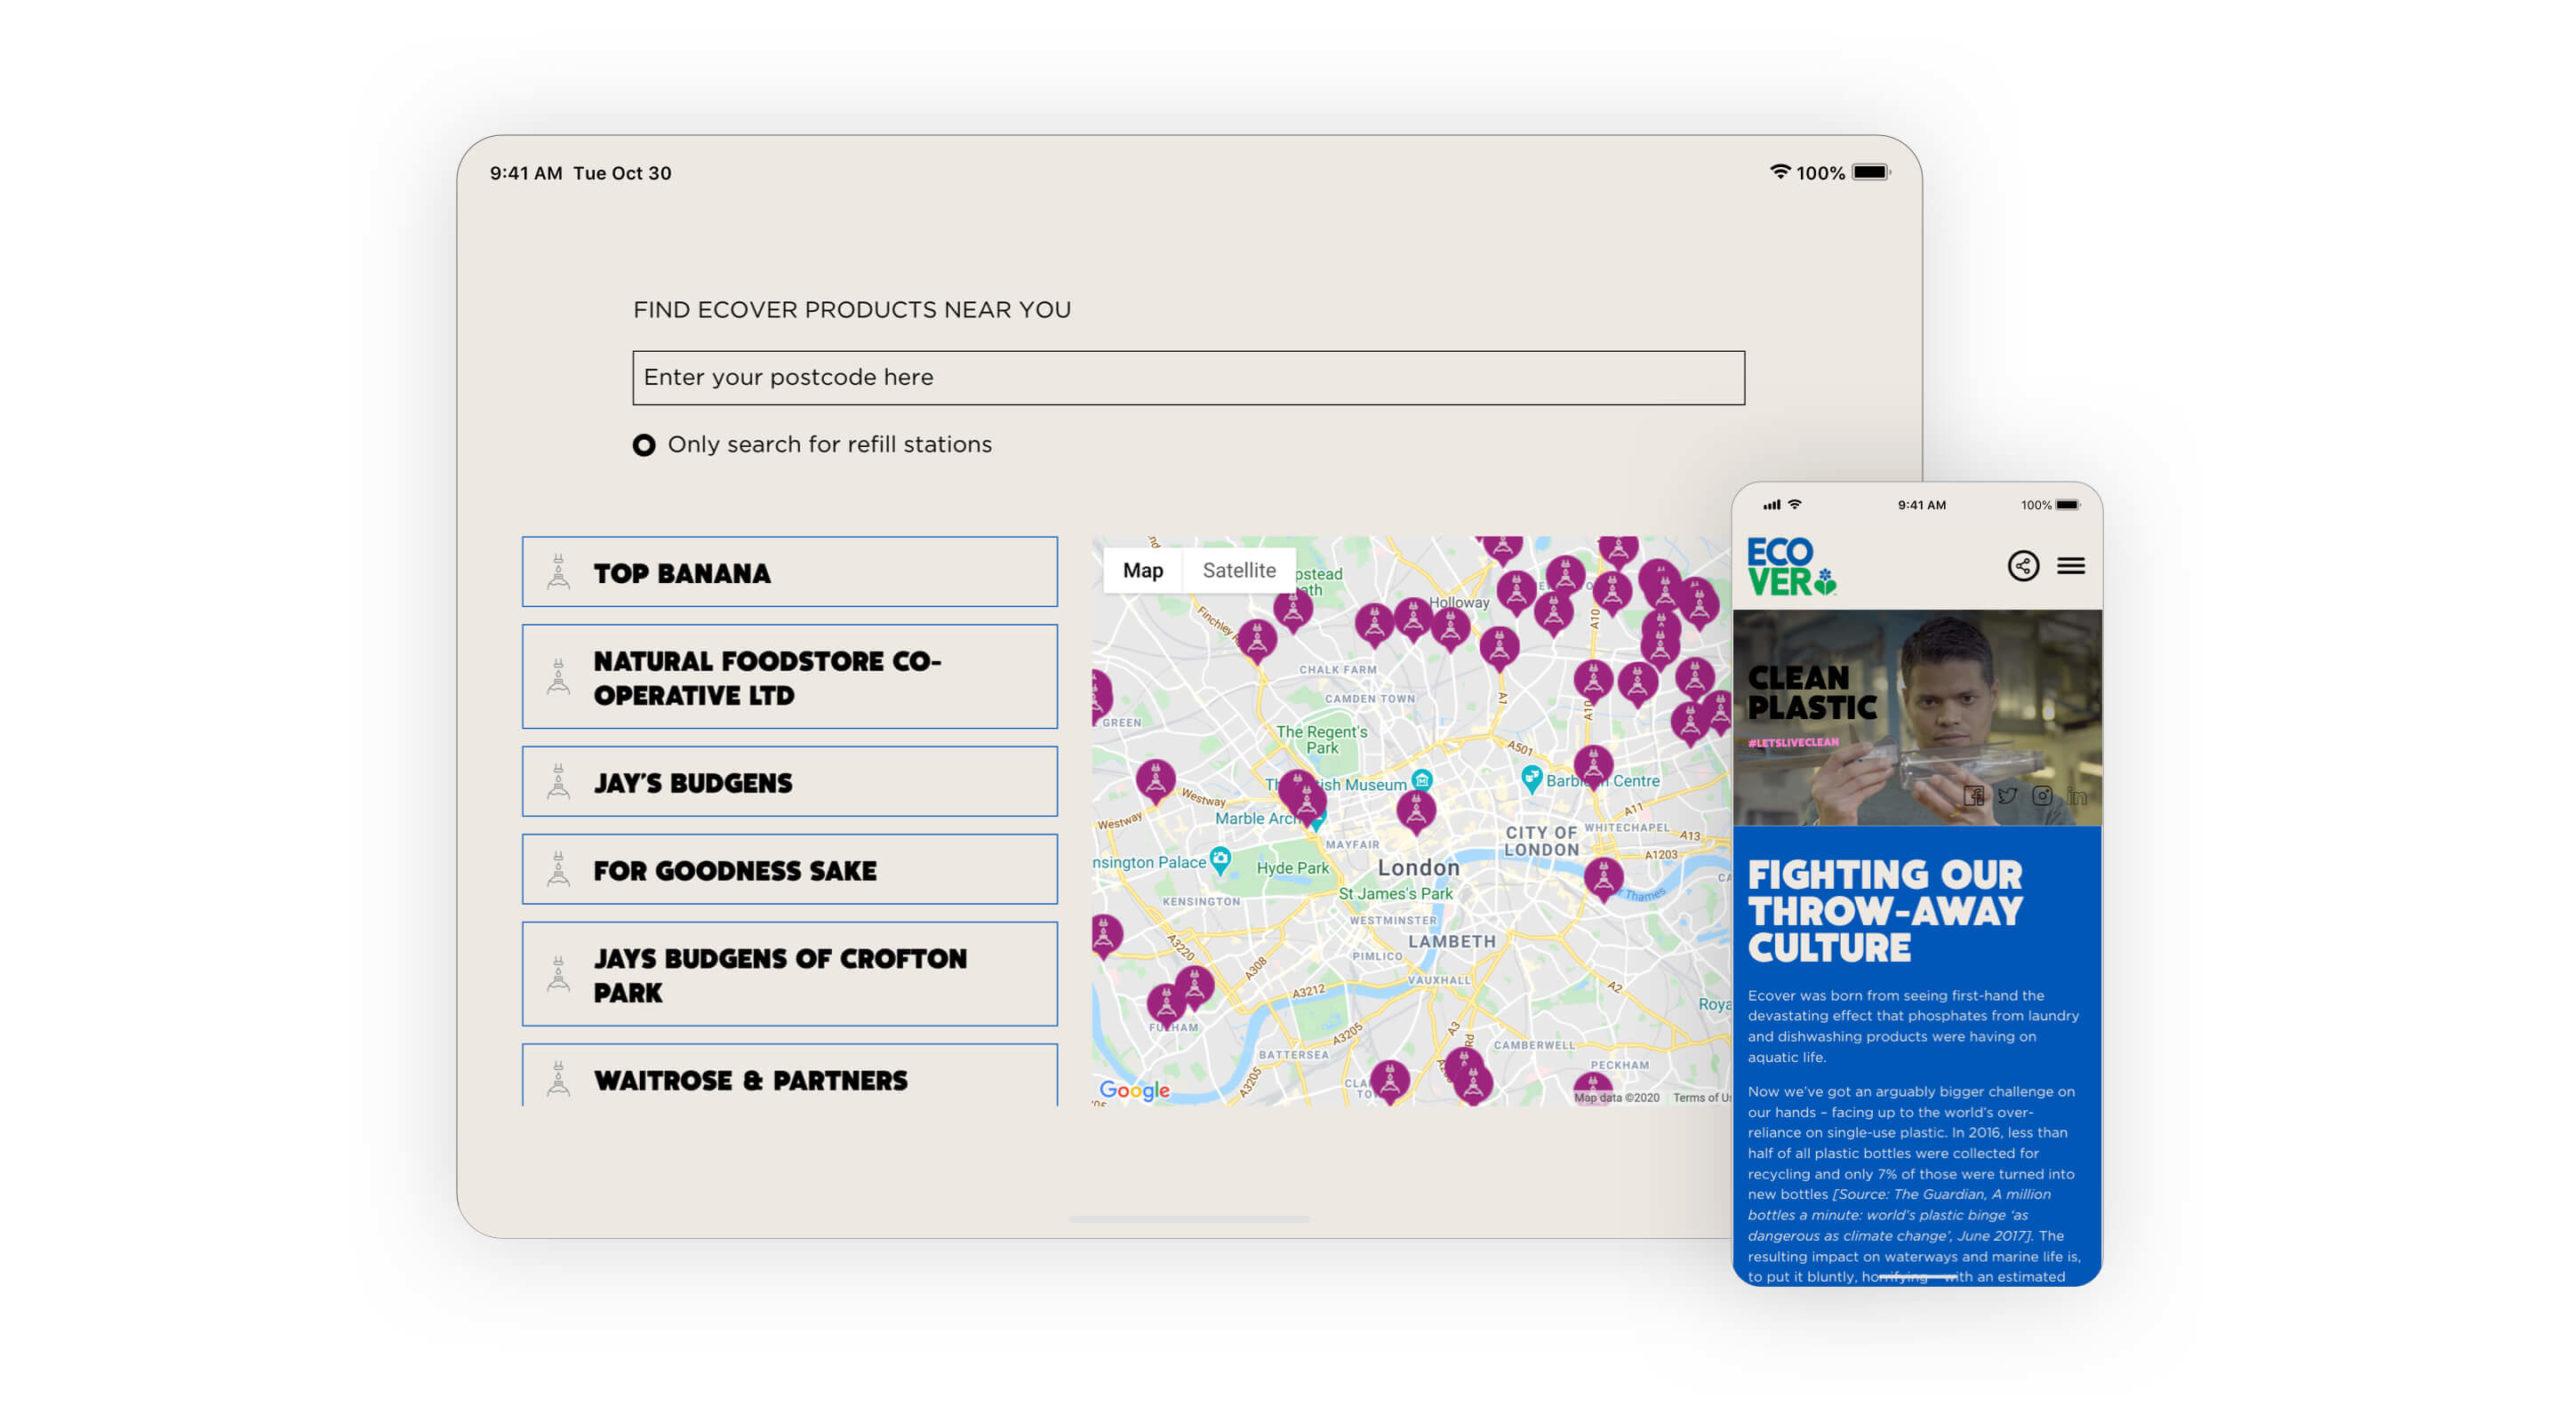 Ecover store locator map screenshot